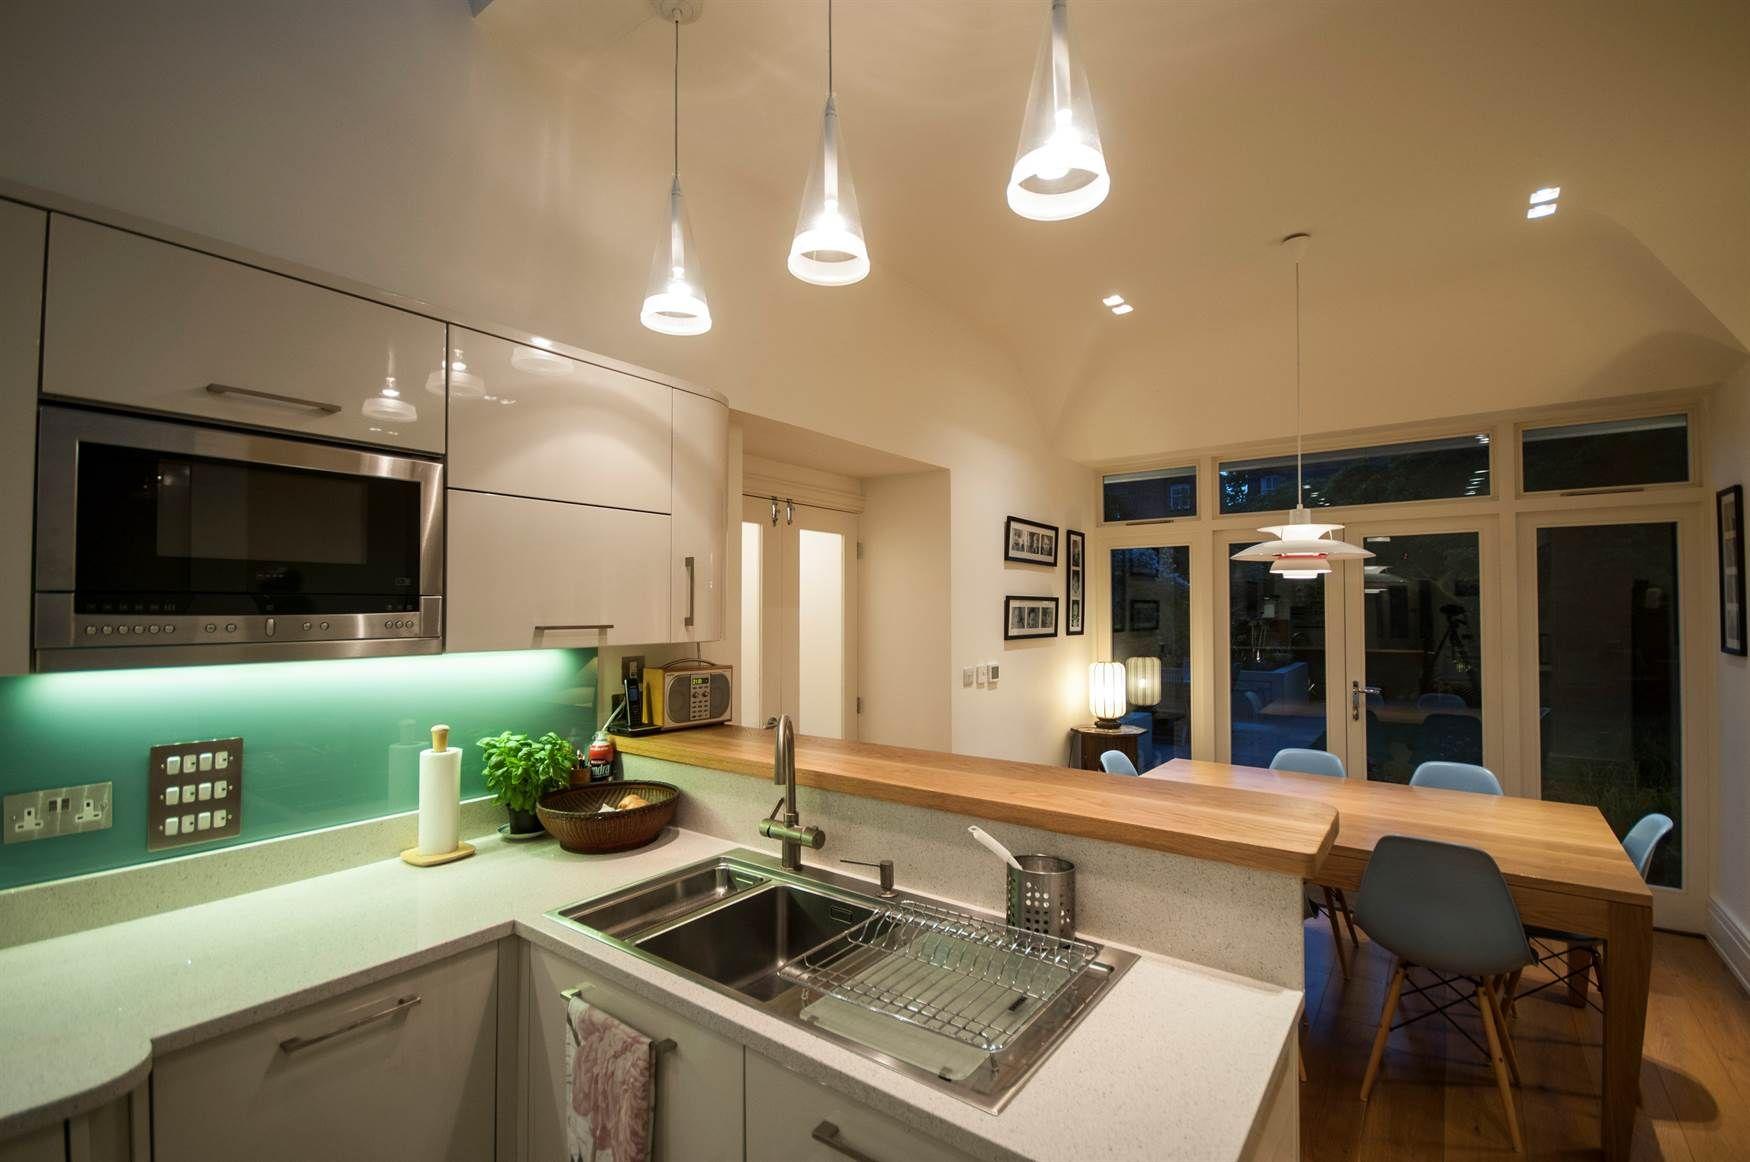 Kitchen Light Design Interesting Kitchen Lighting Design Mr Resistorfucsia Pendants And Trimless 2018